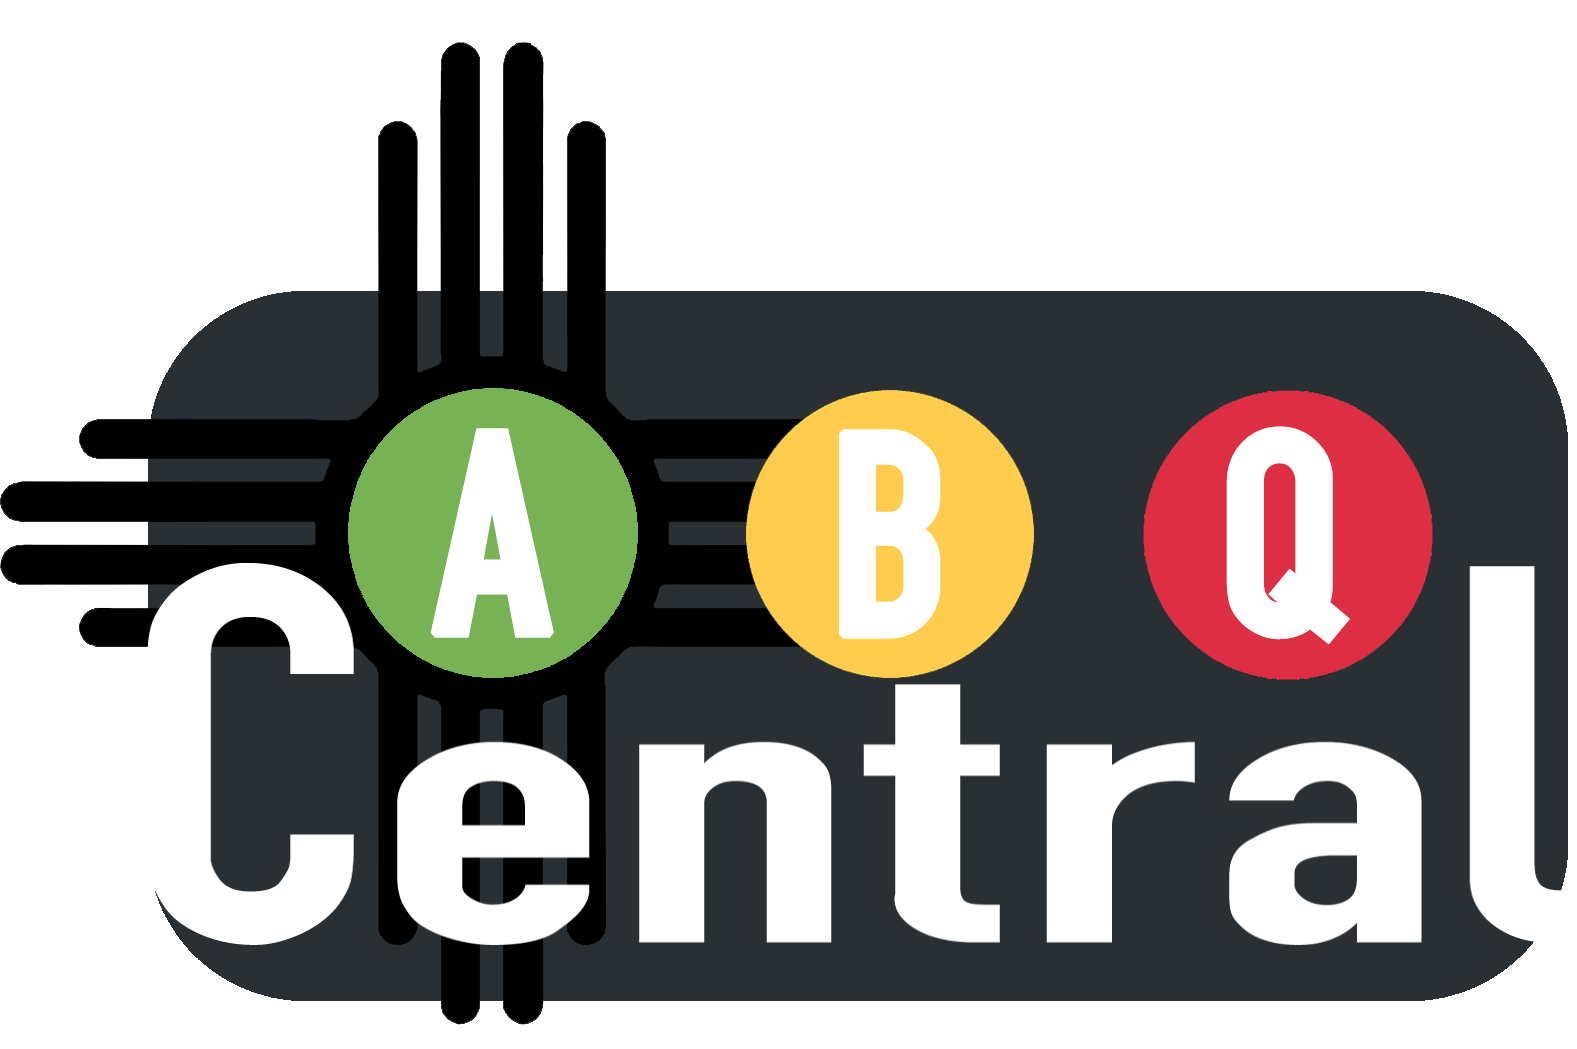 ABQcentral